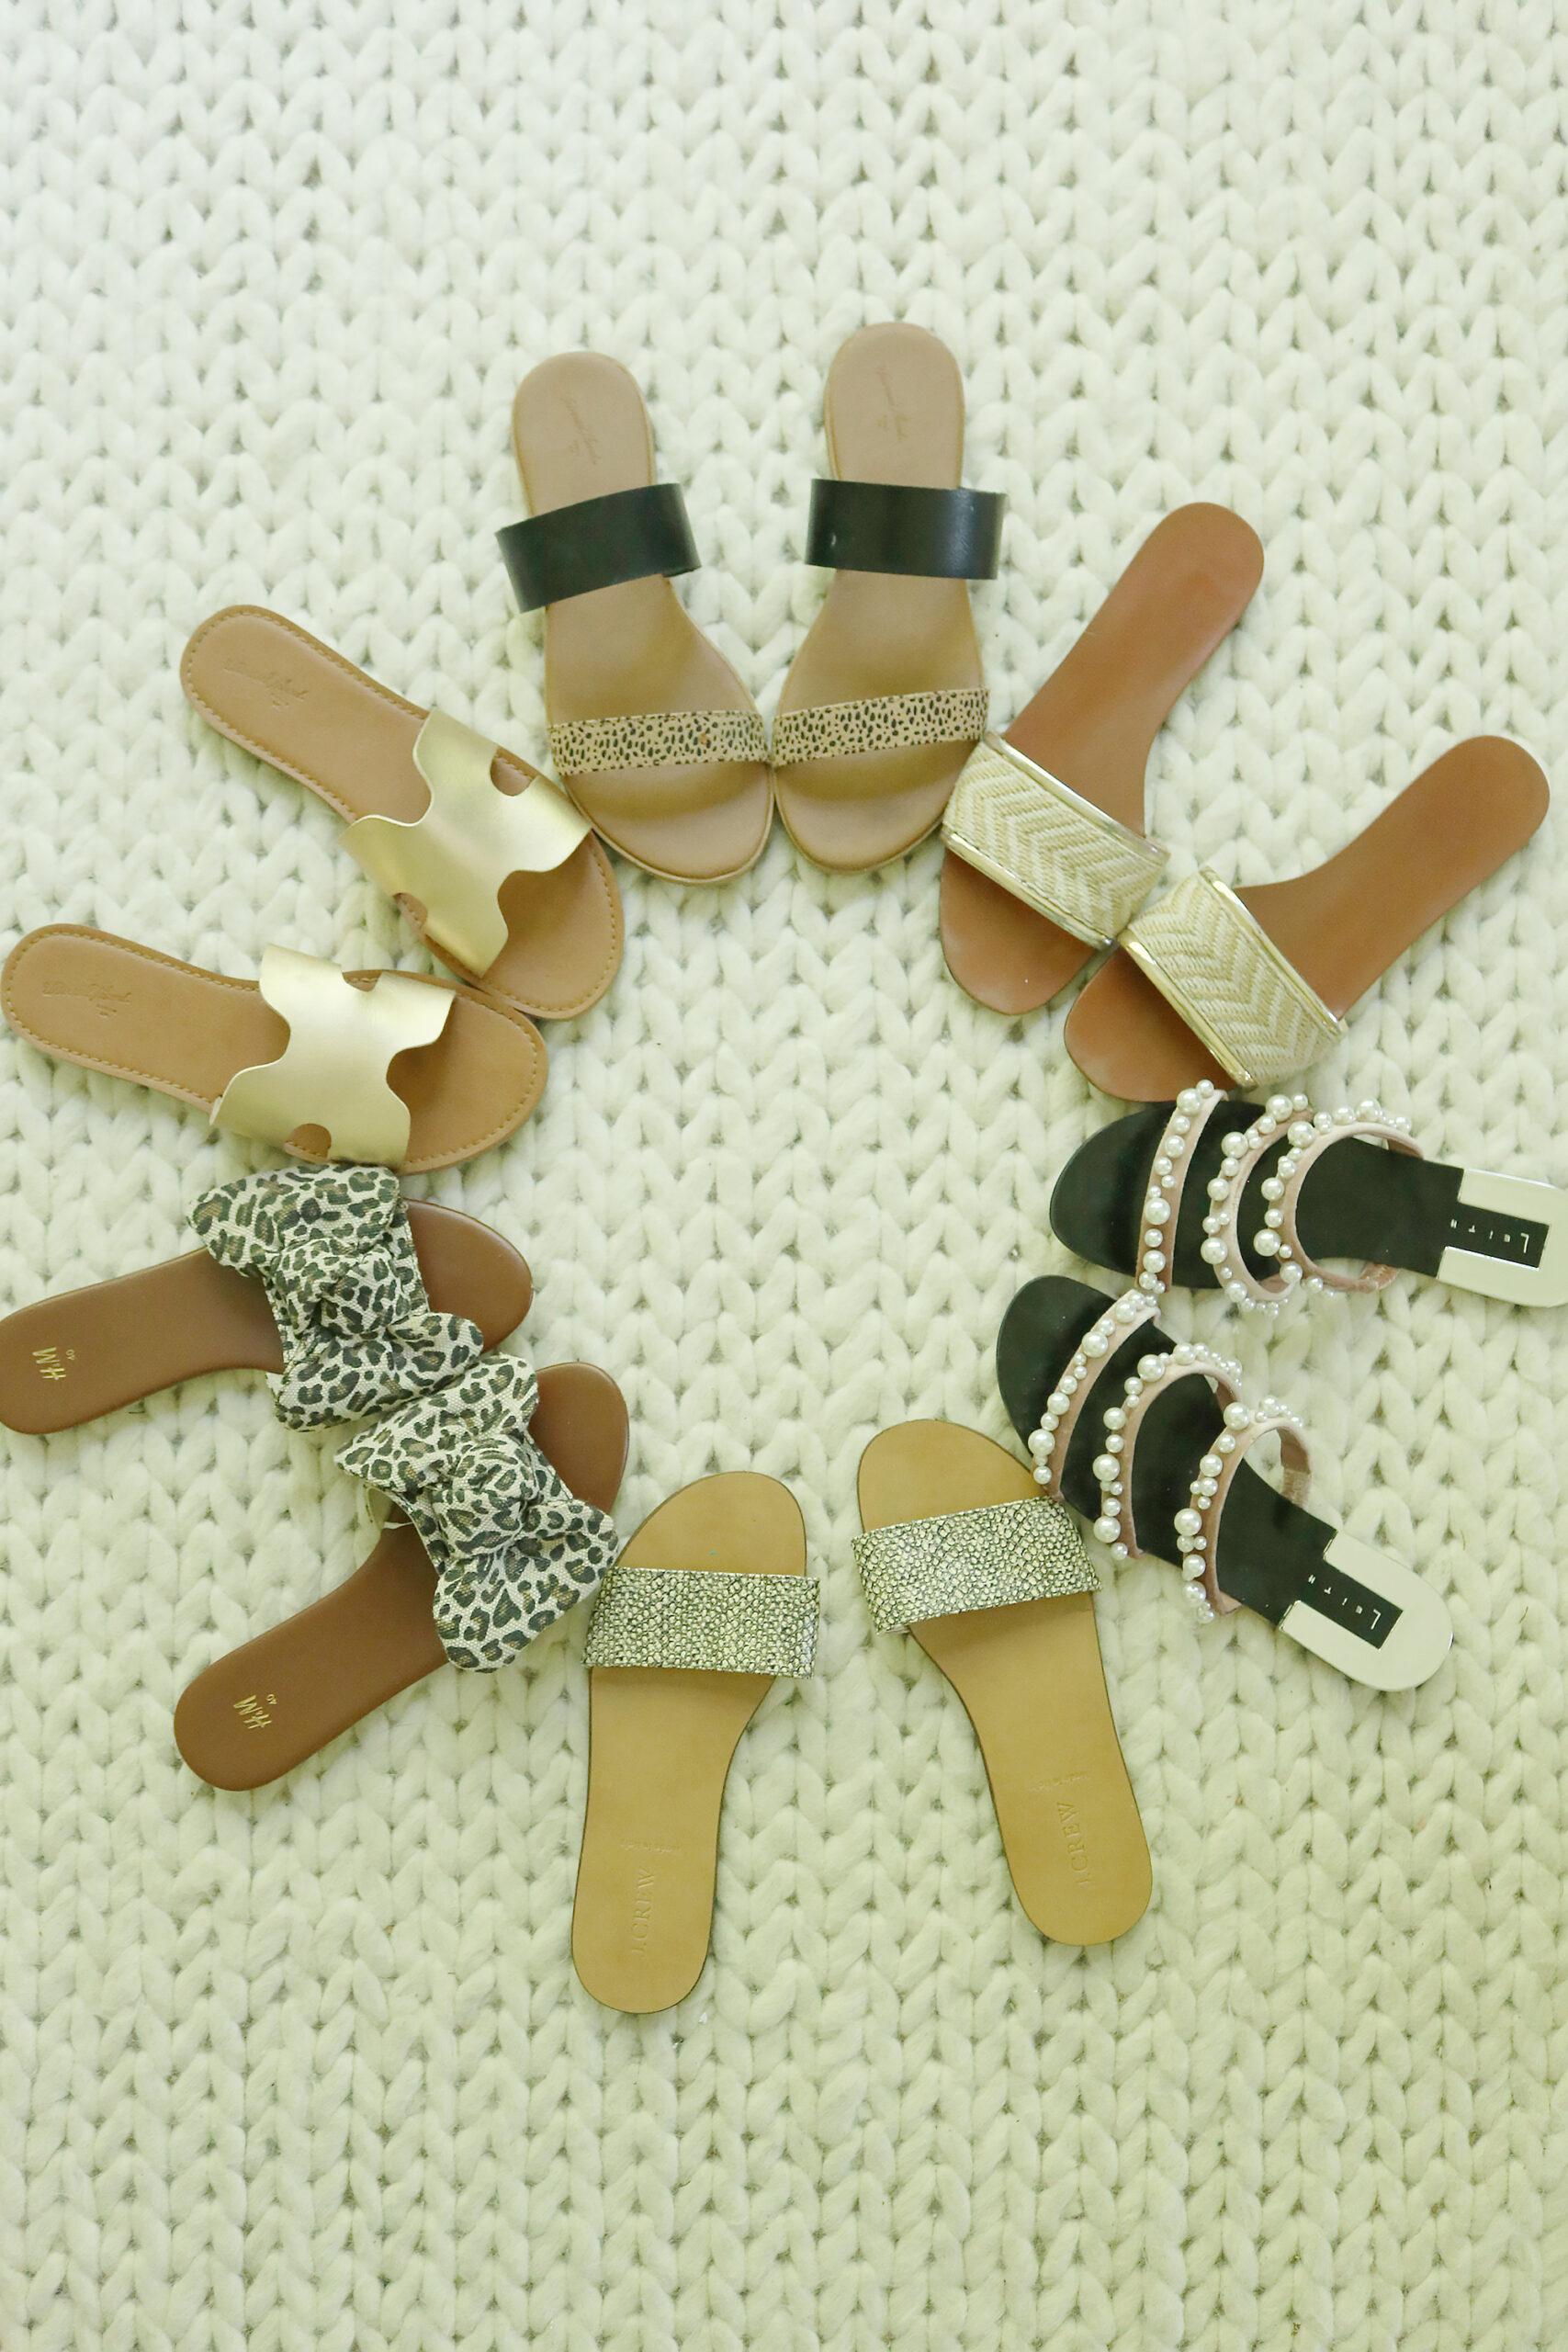 Best Summer Sandals under $100 that are on trend this season || Darling Darleen Top Lifestyle CT Blogger #summersandals #sandalsunder100